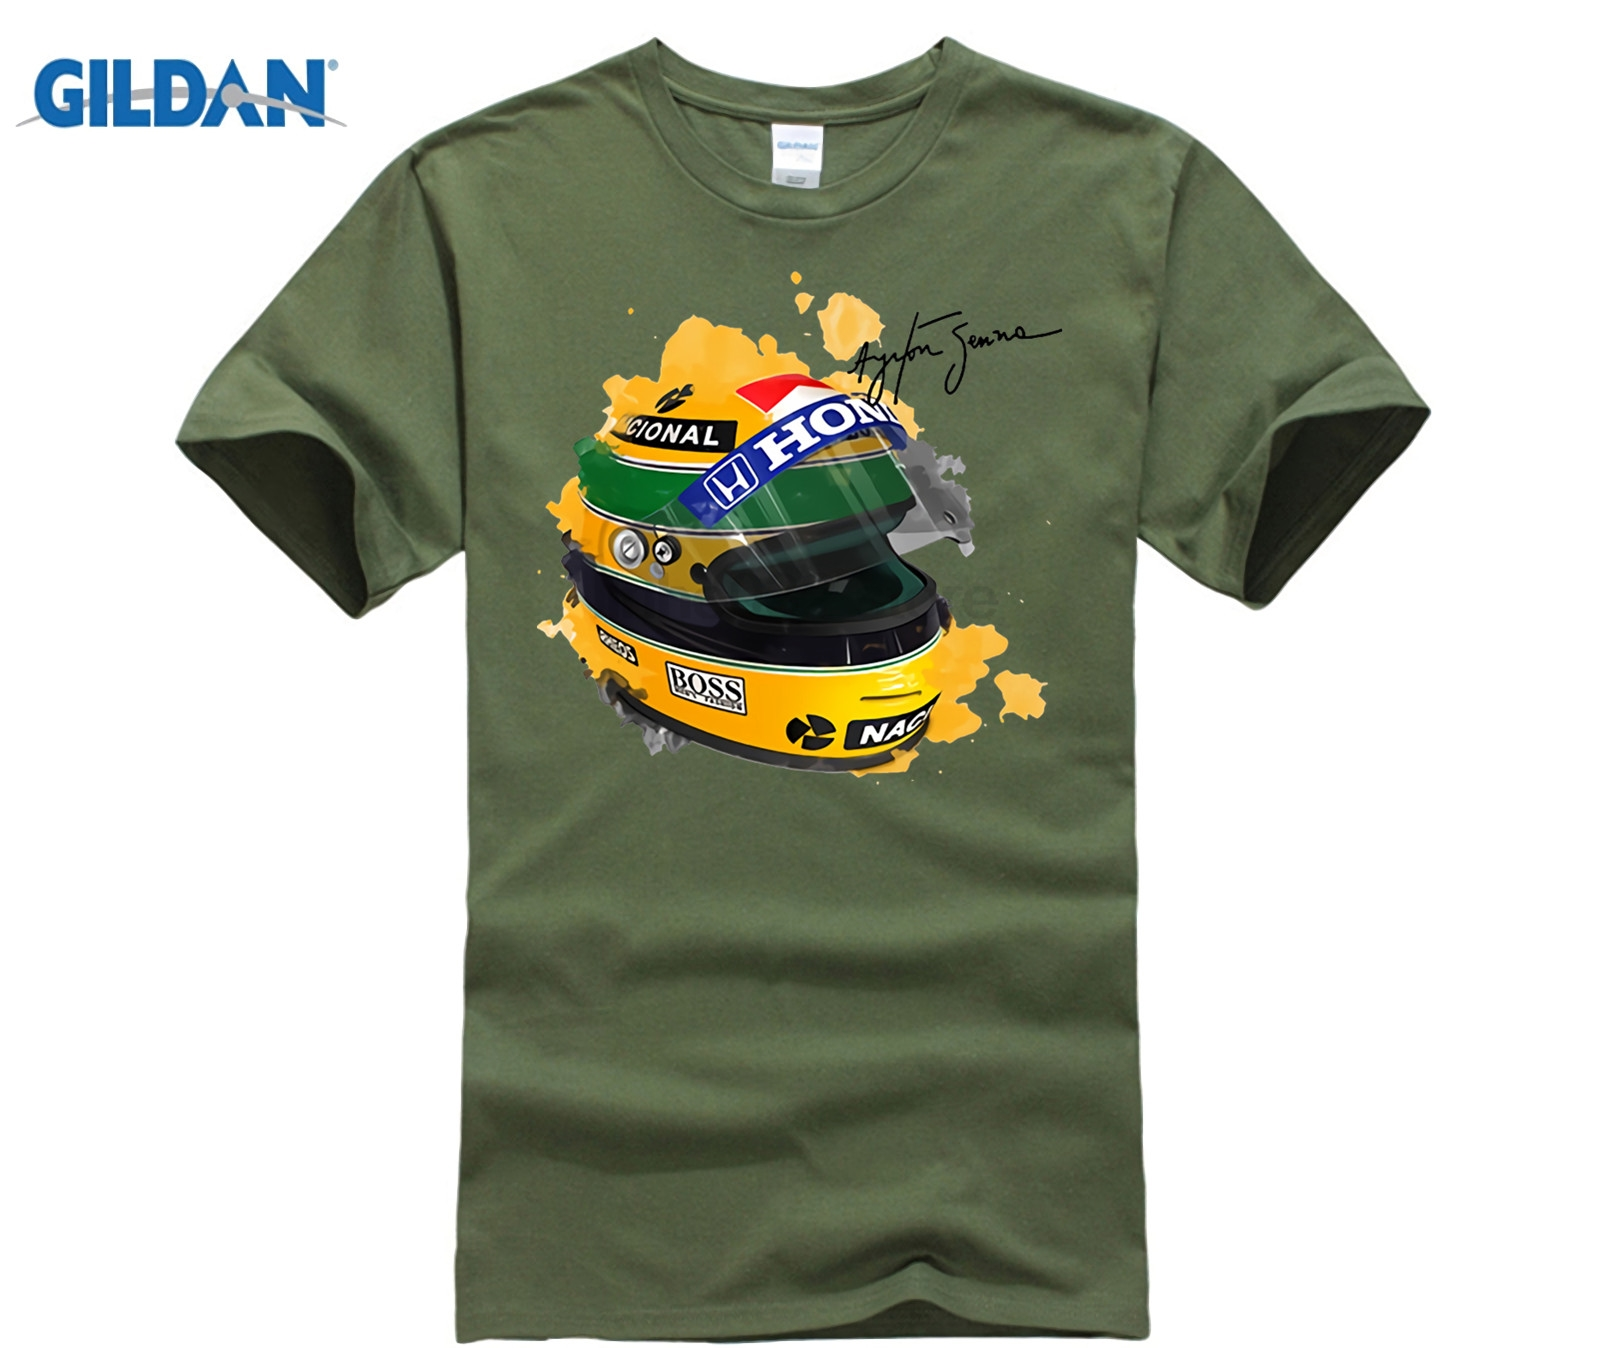 ayrton-font-b-senna-b-font-helmet-t-shirt-tops-1-race-car-watercolor-men-100-cotton-short-sleeve-tee-shirt-signature-man-t-shirt